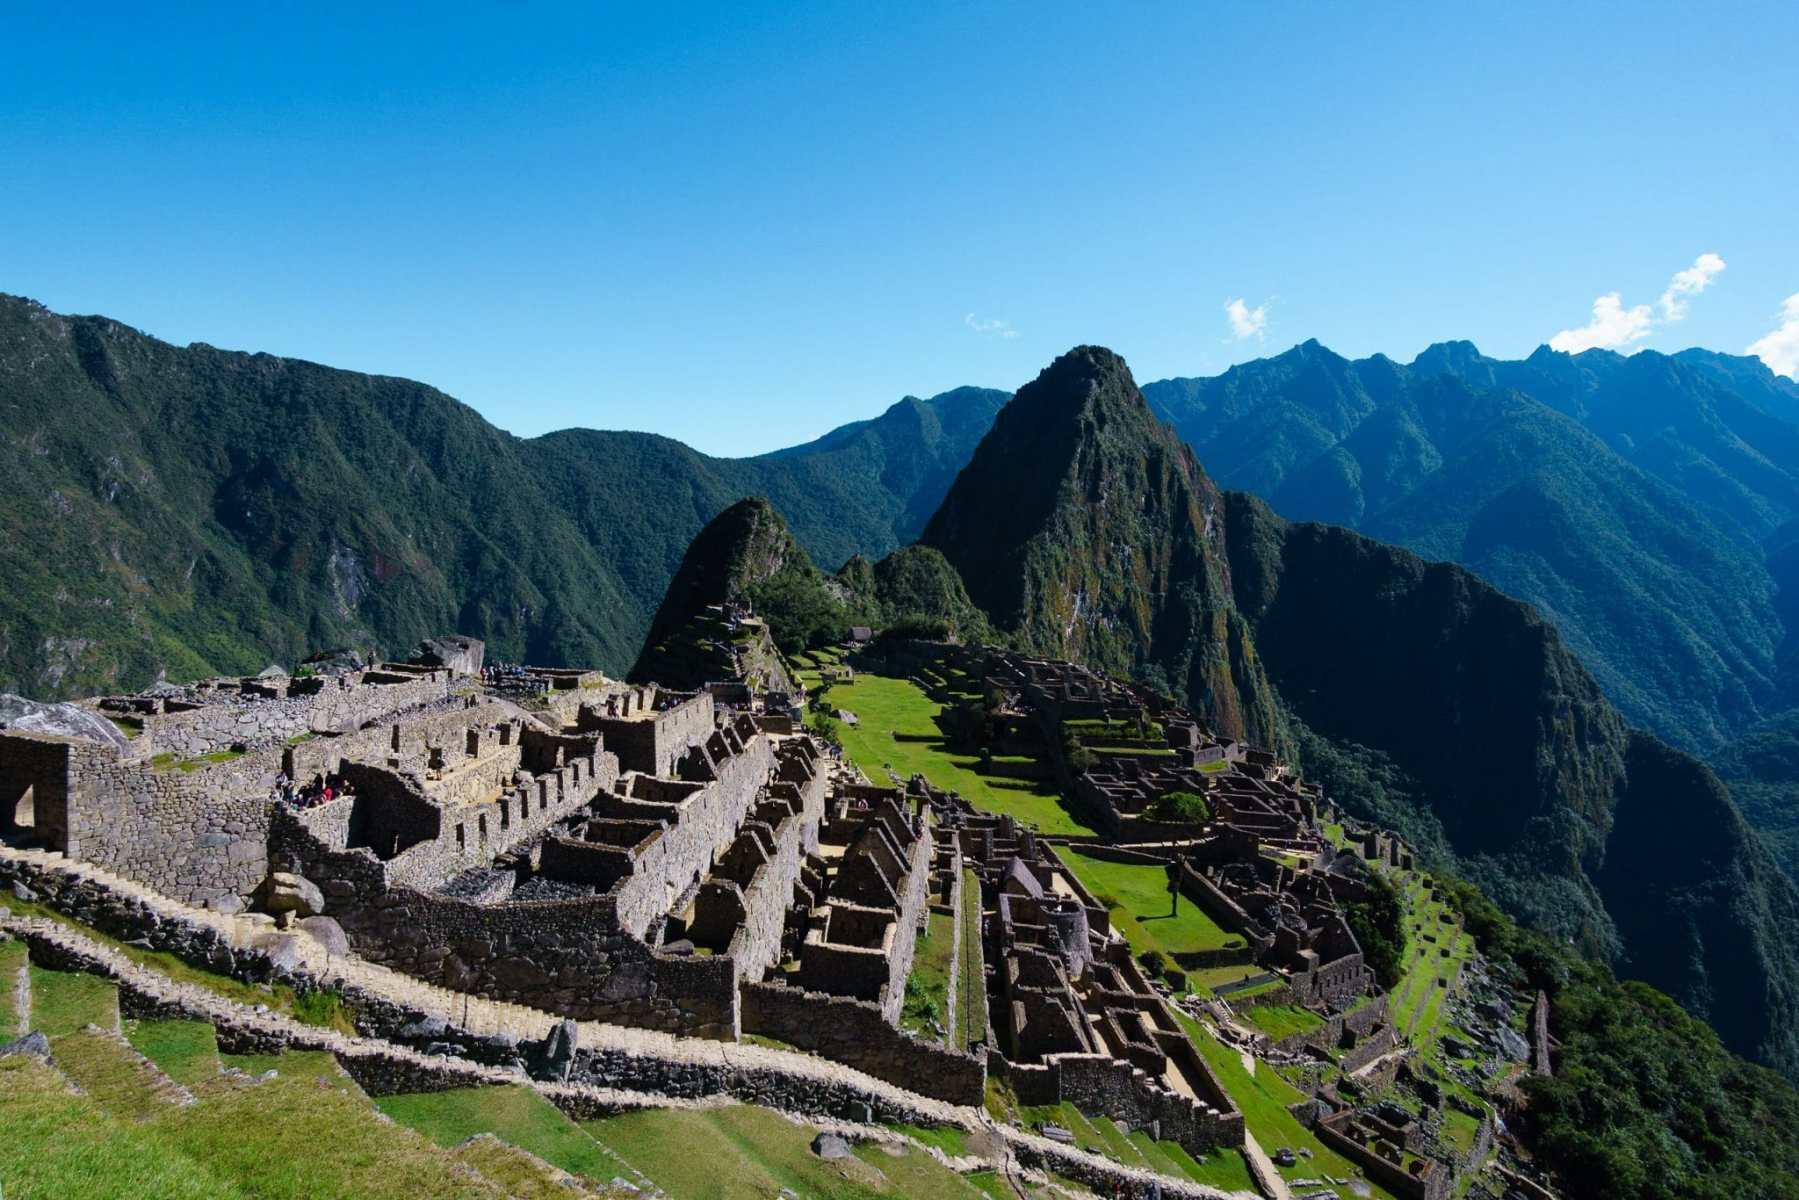 Machu Picchu after completing the Salkantay Trek